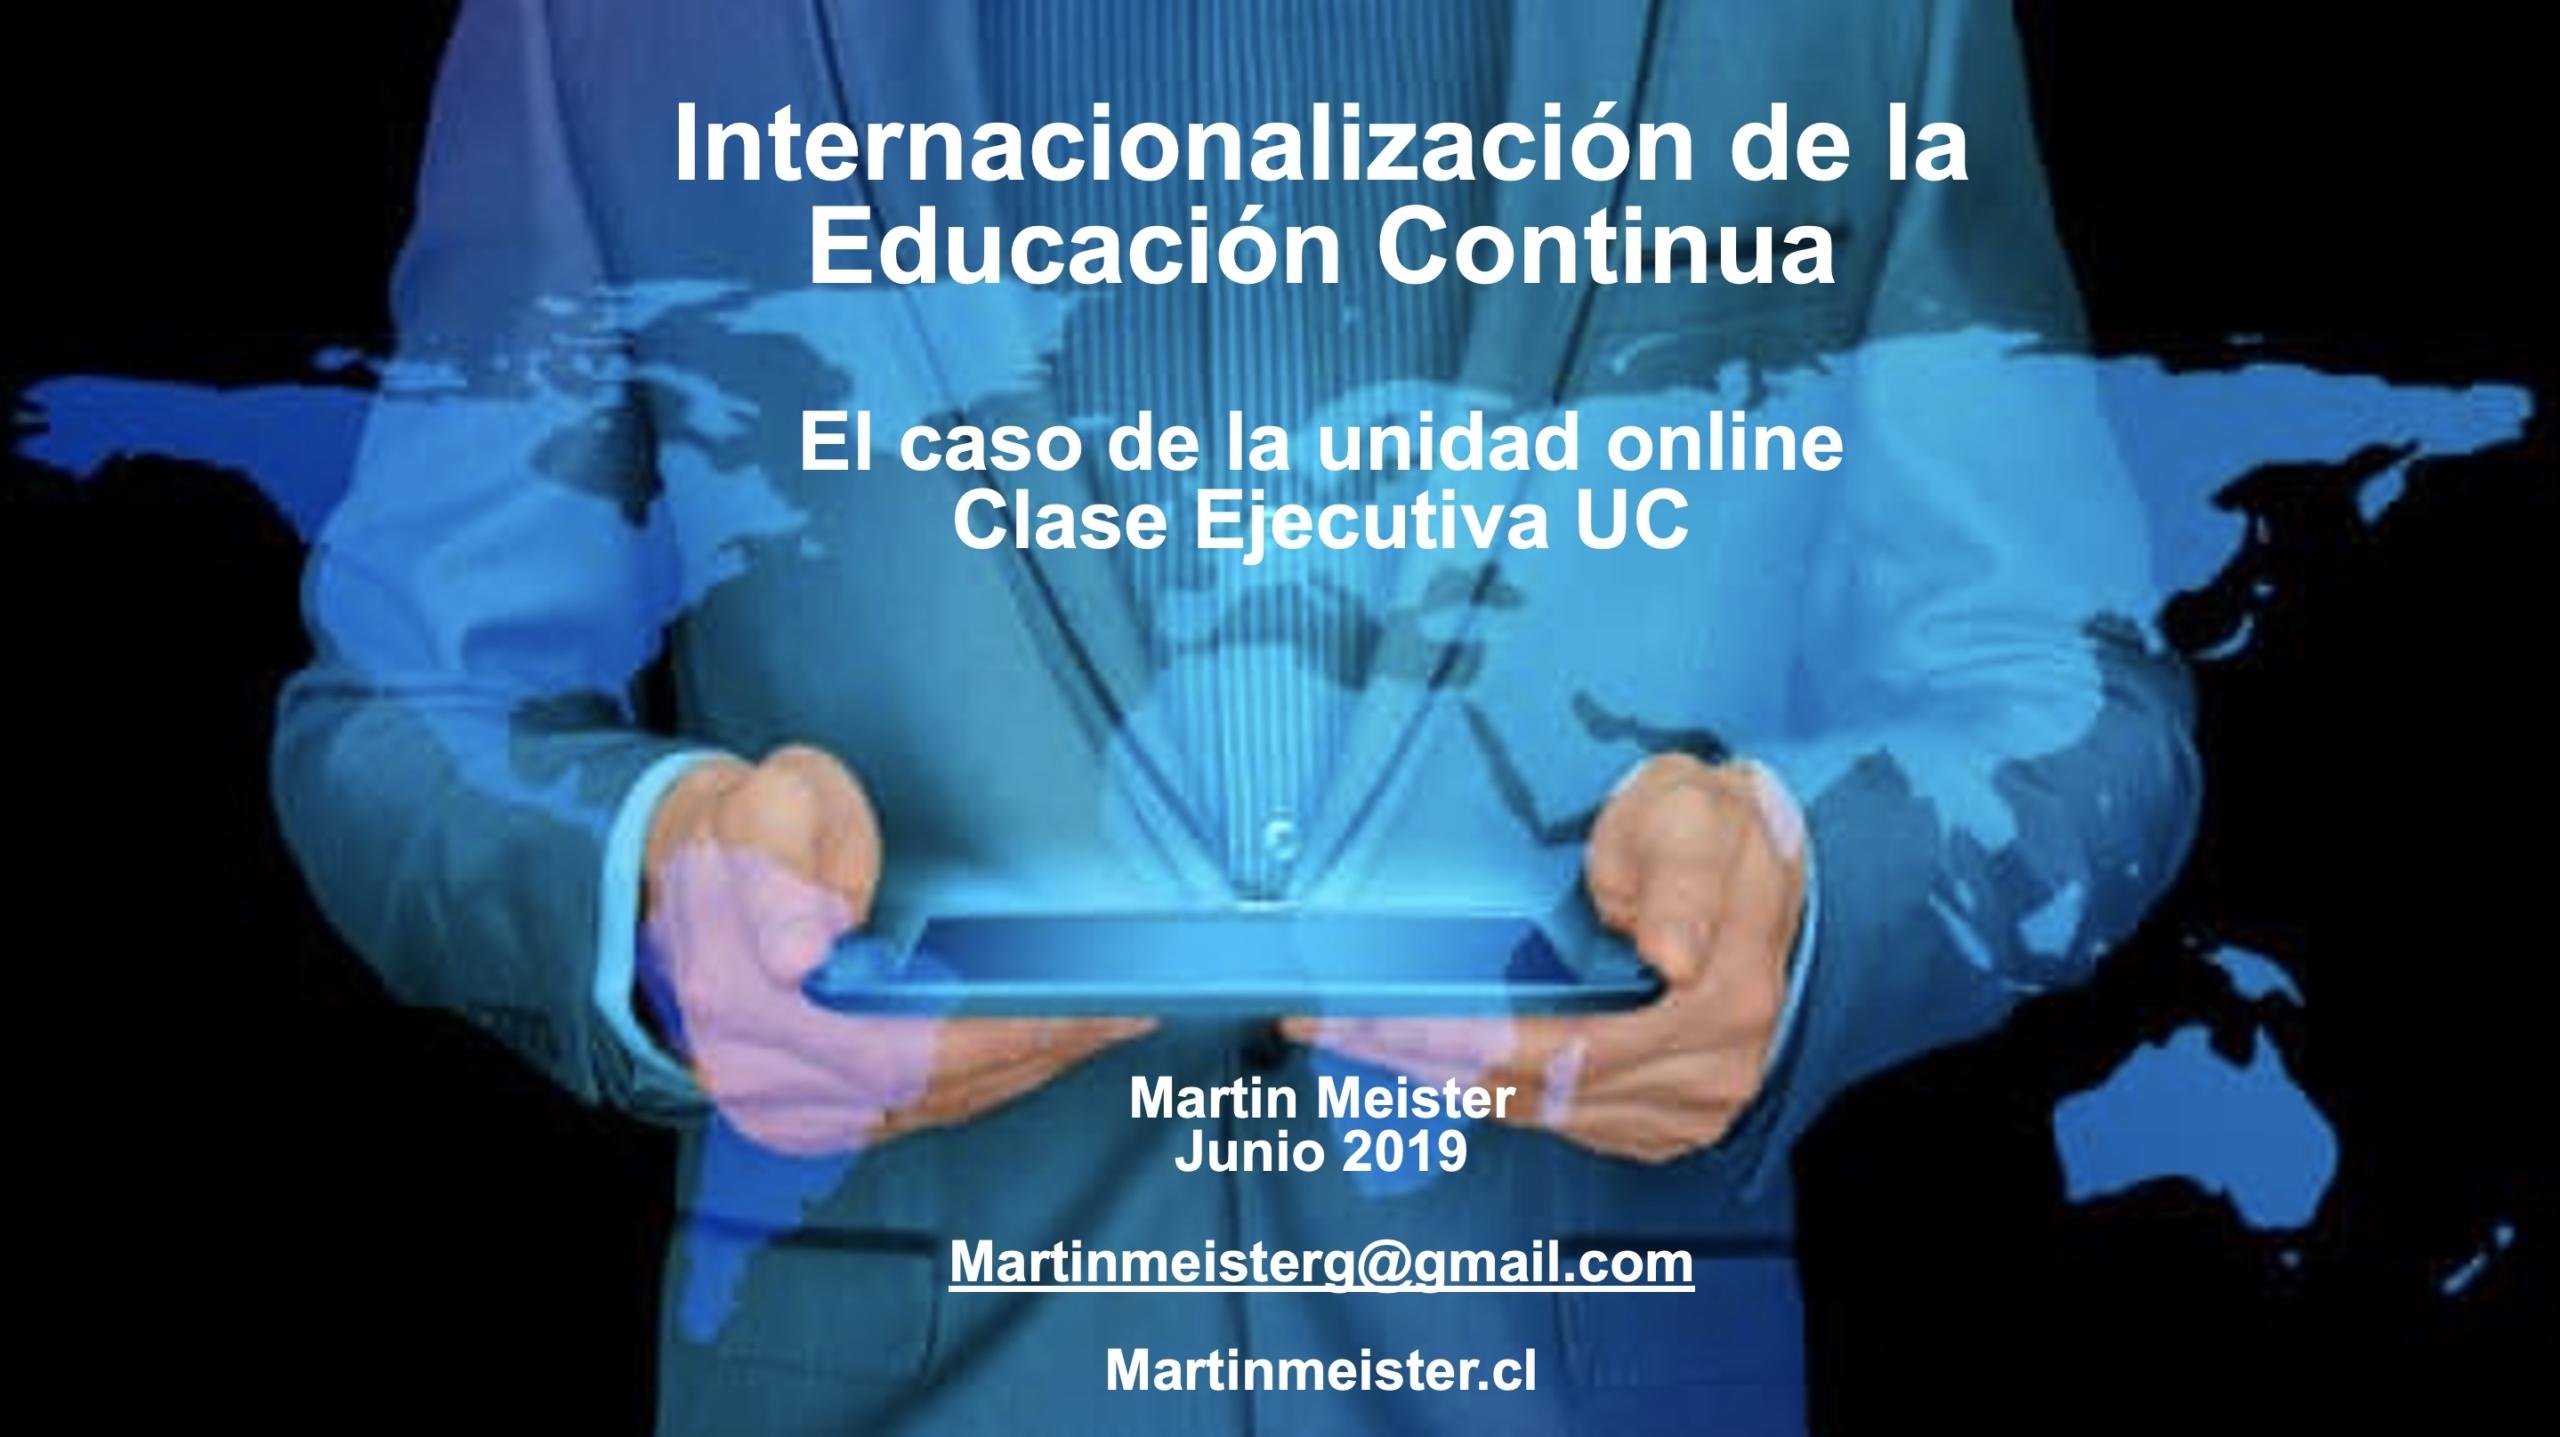 Internacionalizacion de la educacion continua - Martin Meister